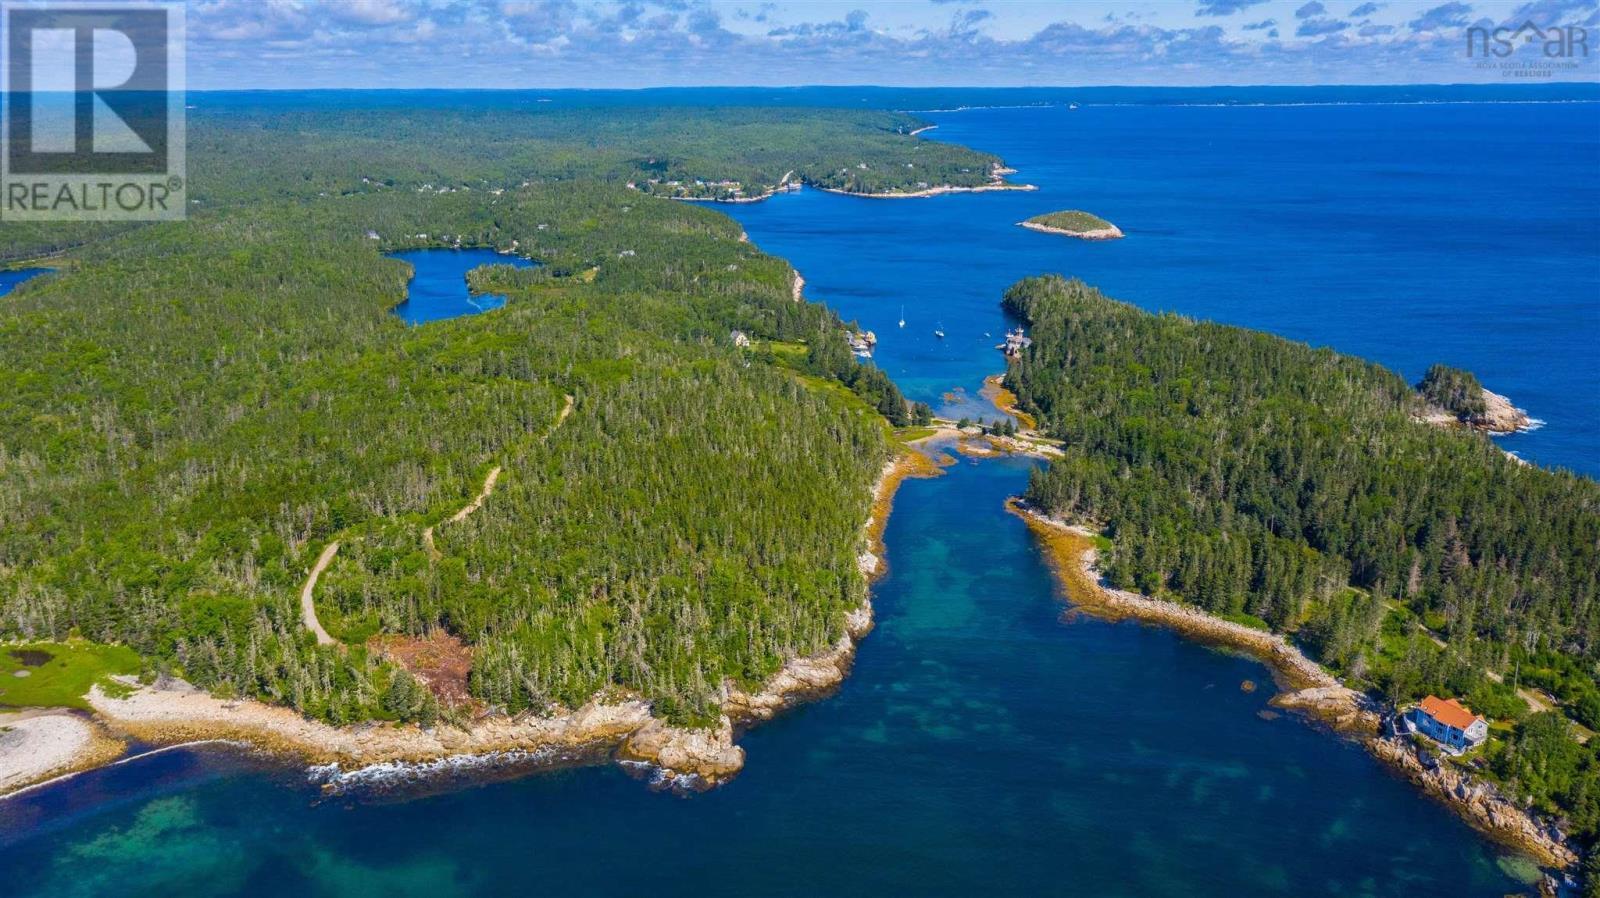 Lot W20-3 Owl's Head Drive, Southwest Cove, Nova Scotia  B0J 1T0 - Photo 6 - 202125696